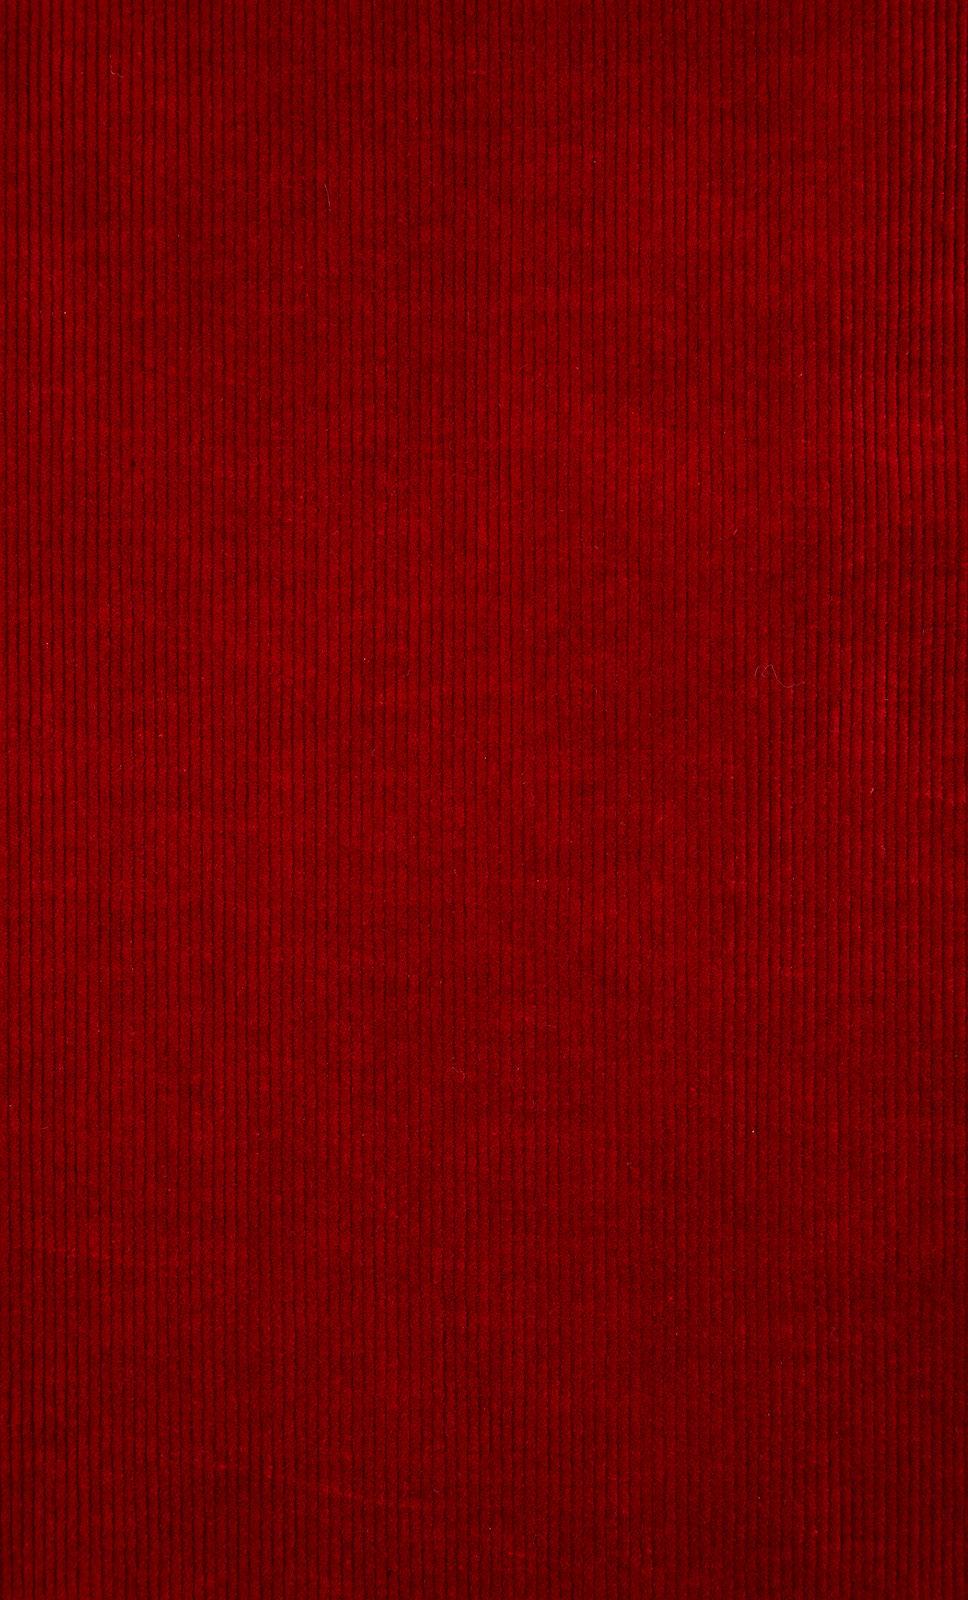 Corduroy-Sienna-Red